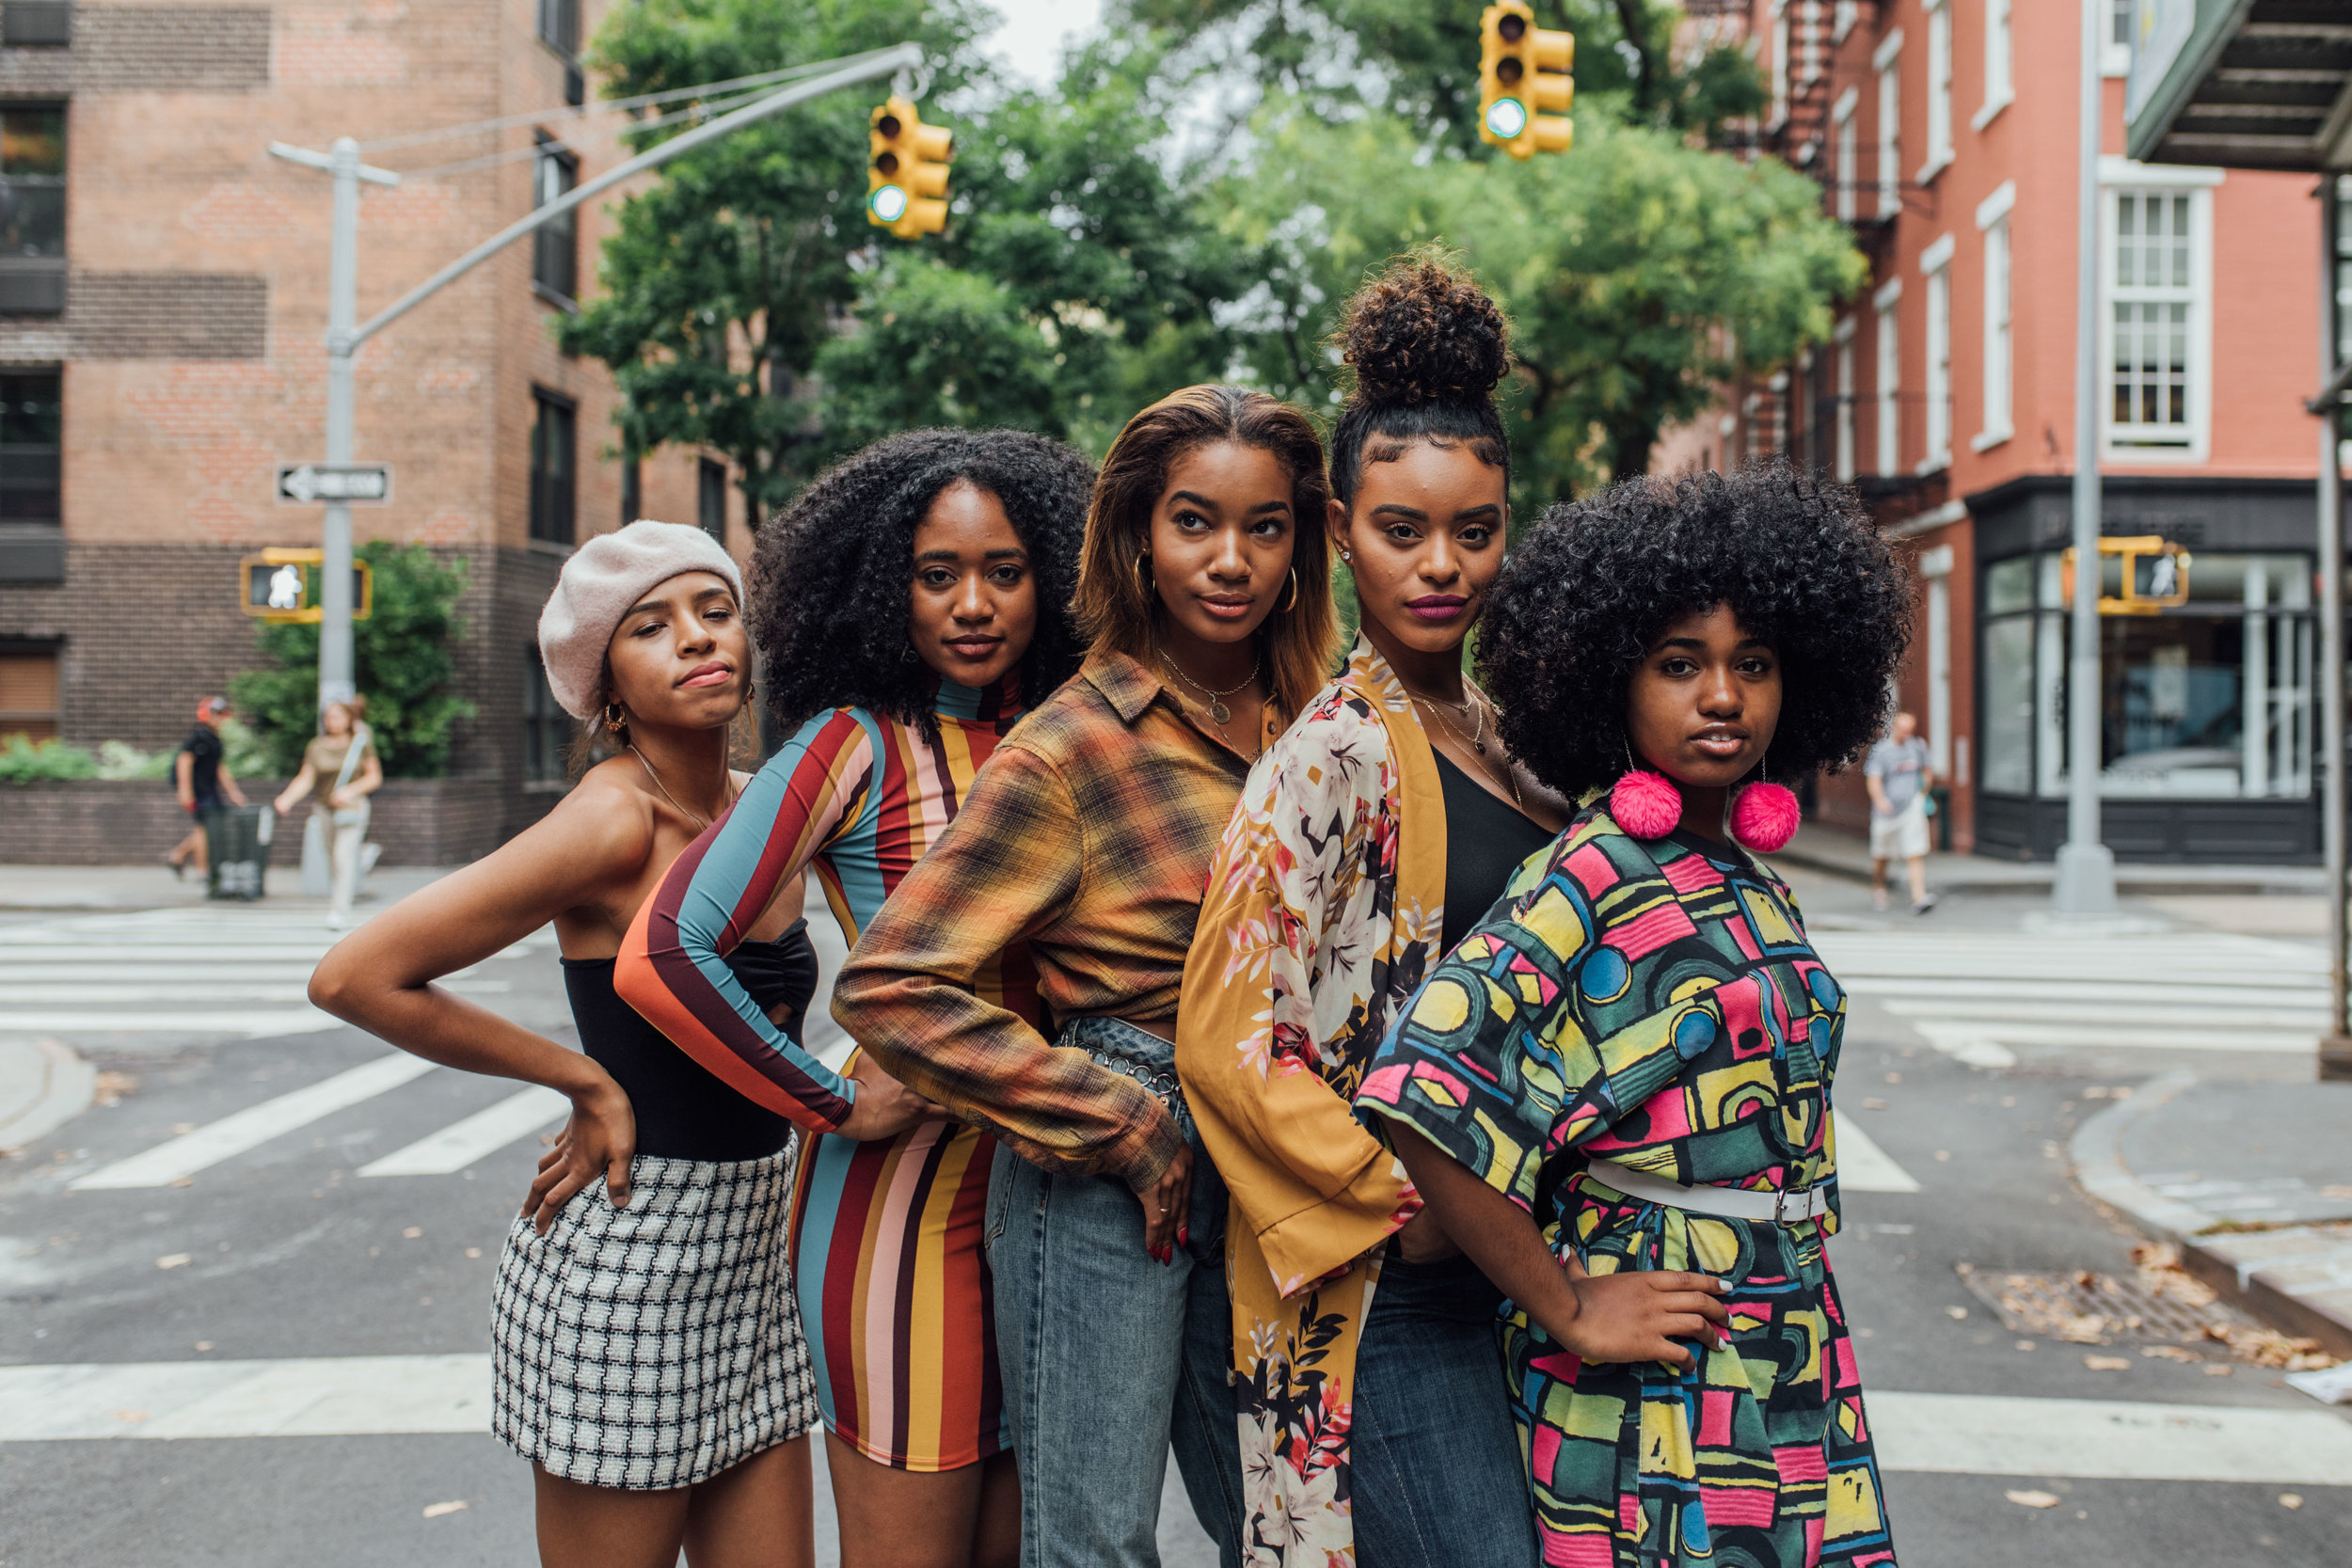 new_york_city_fashion_photographer (7 of 8).jpg